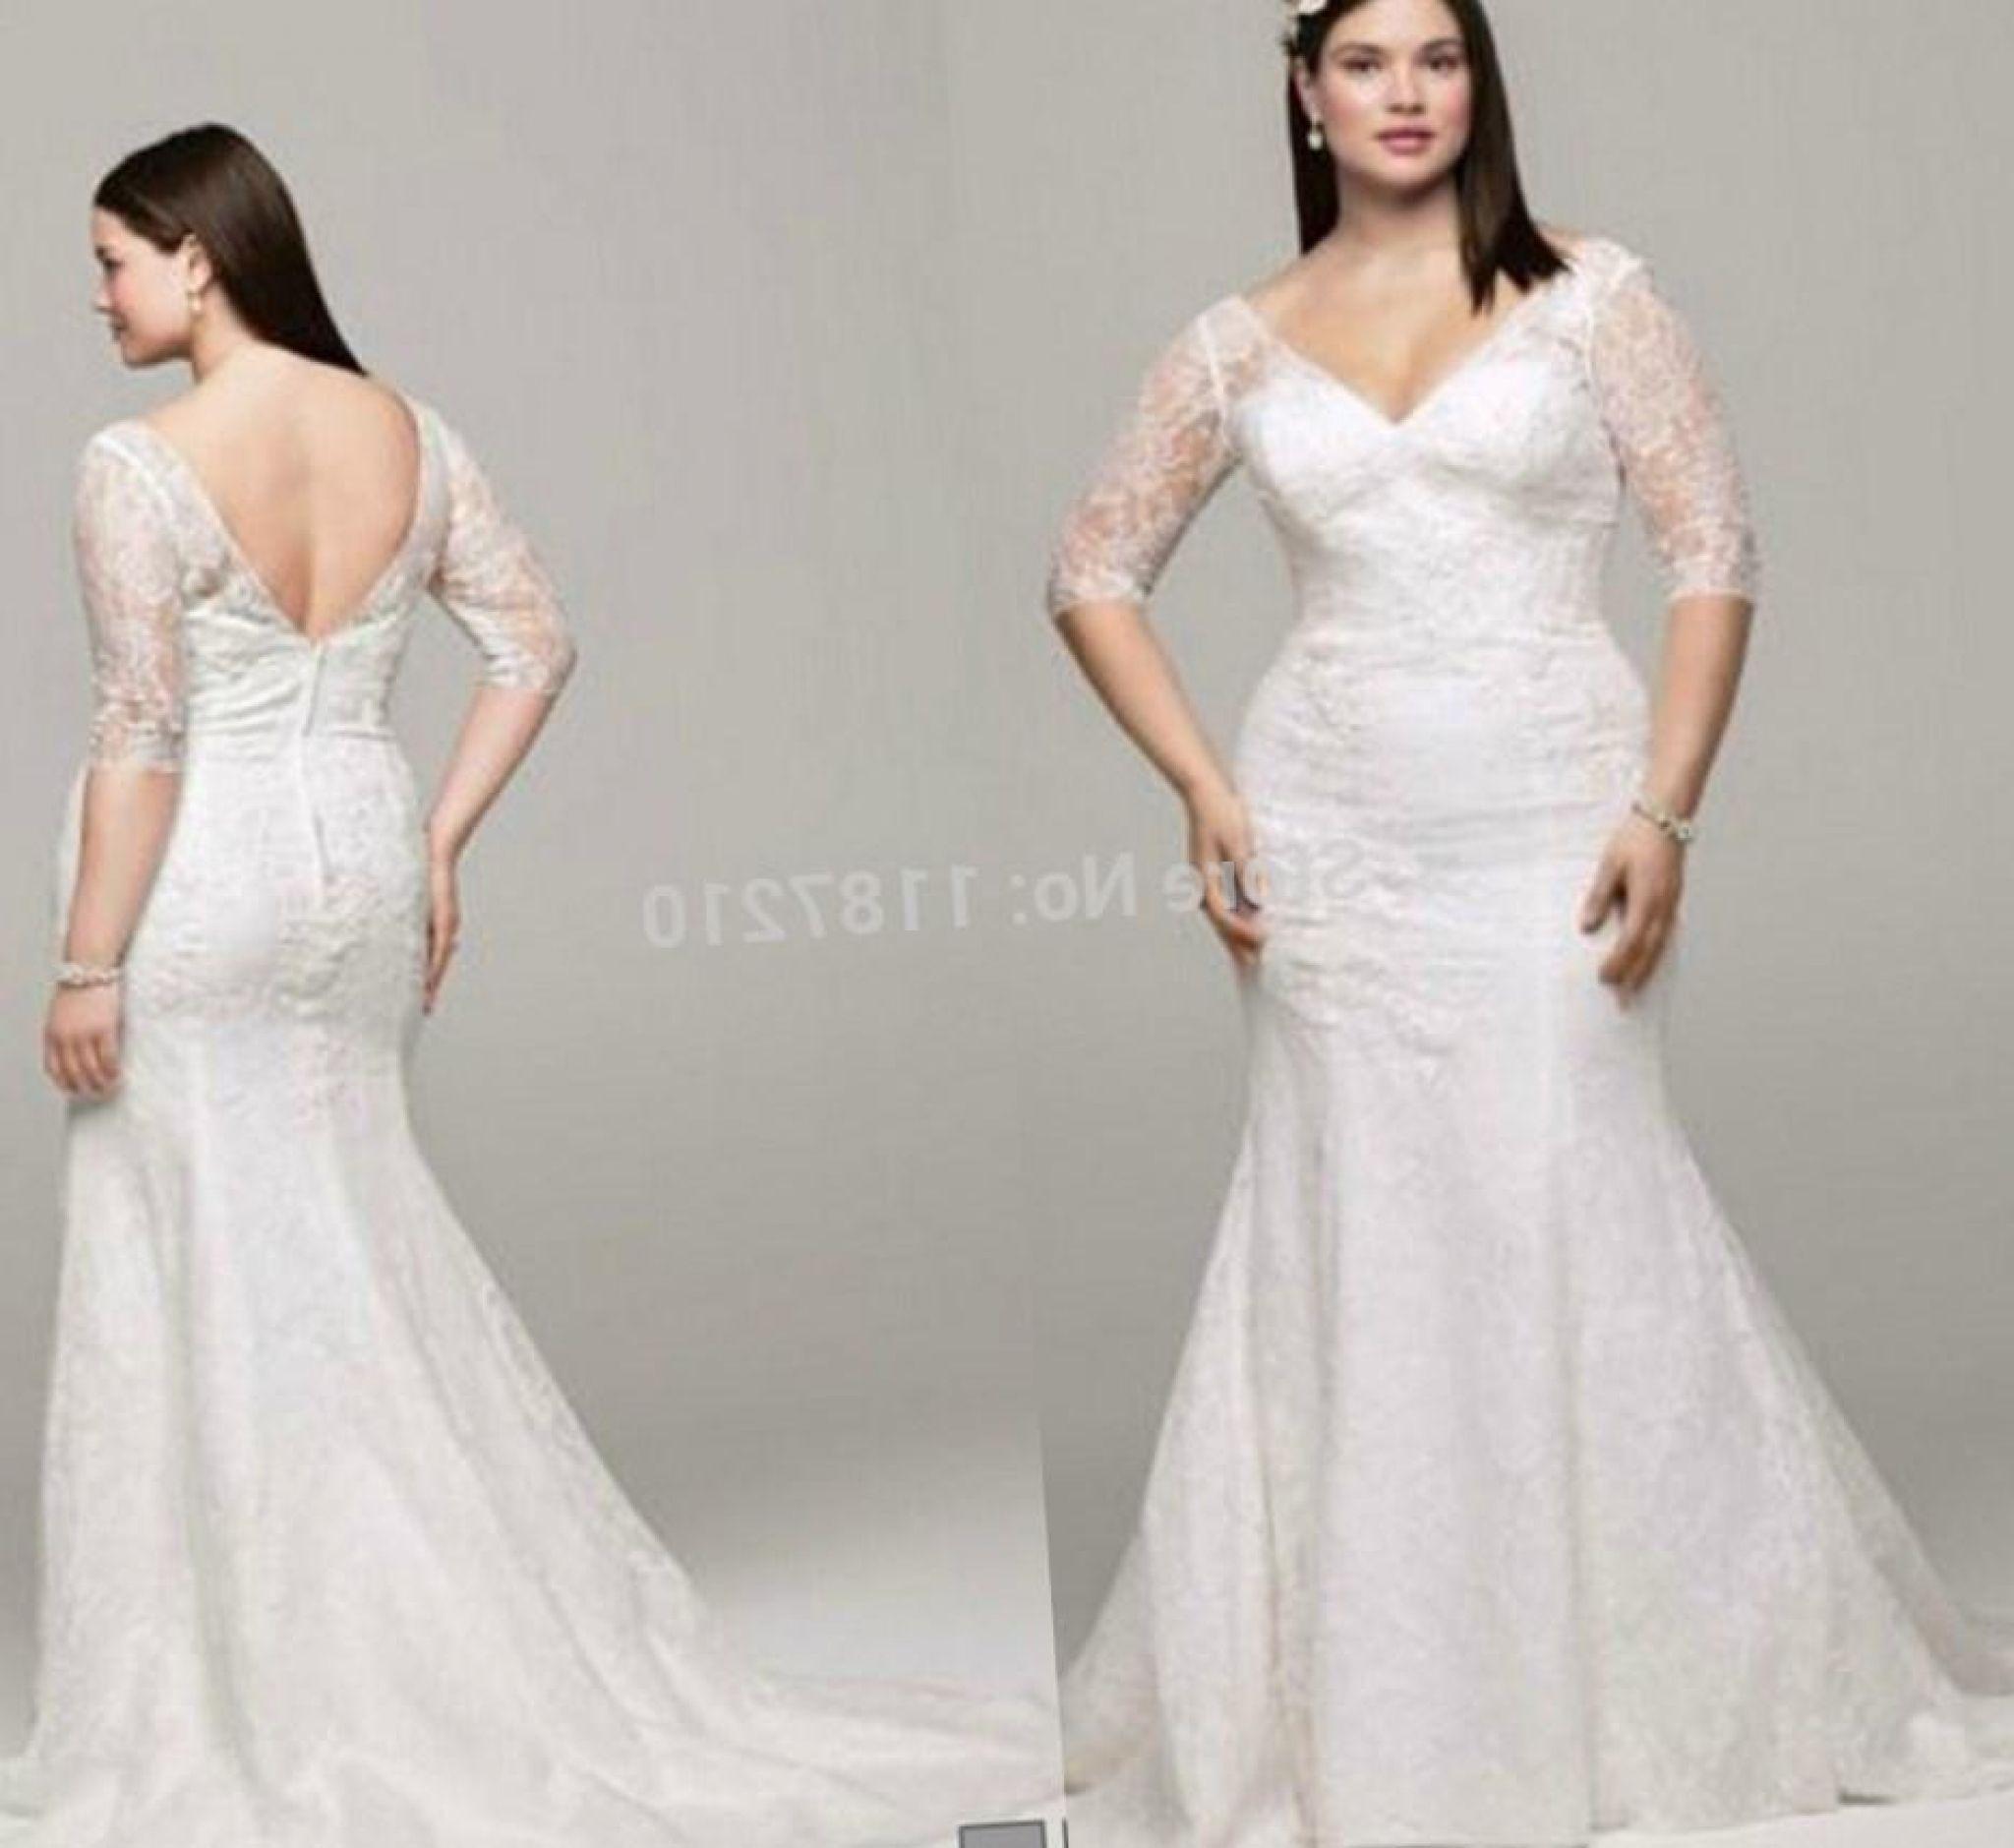 Vintage Plus Size Wedding Dresses Best Dresses For Wedding Check